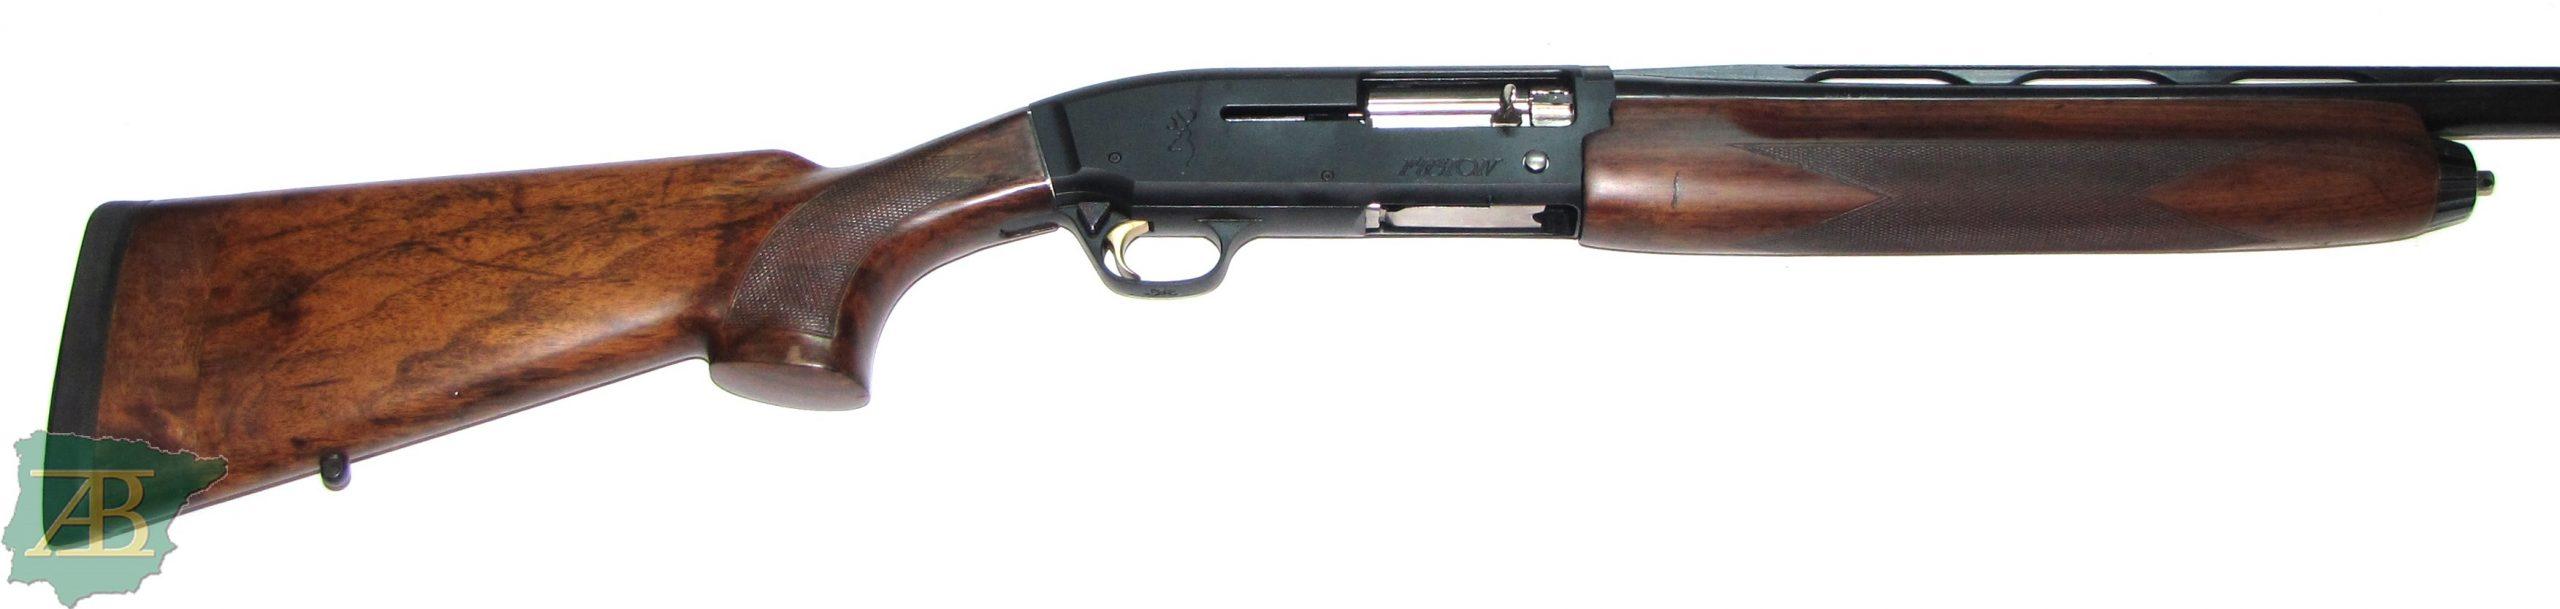 Escopeta semiautomática de caza BROWNING FUSION-armeriaiberica-2